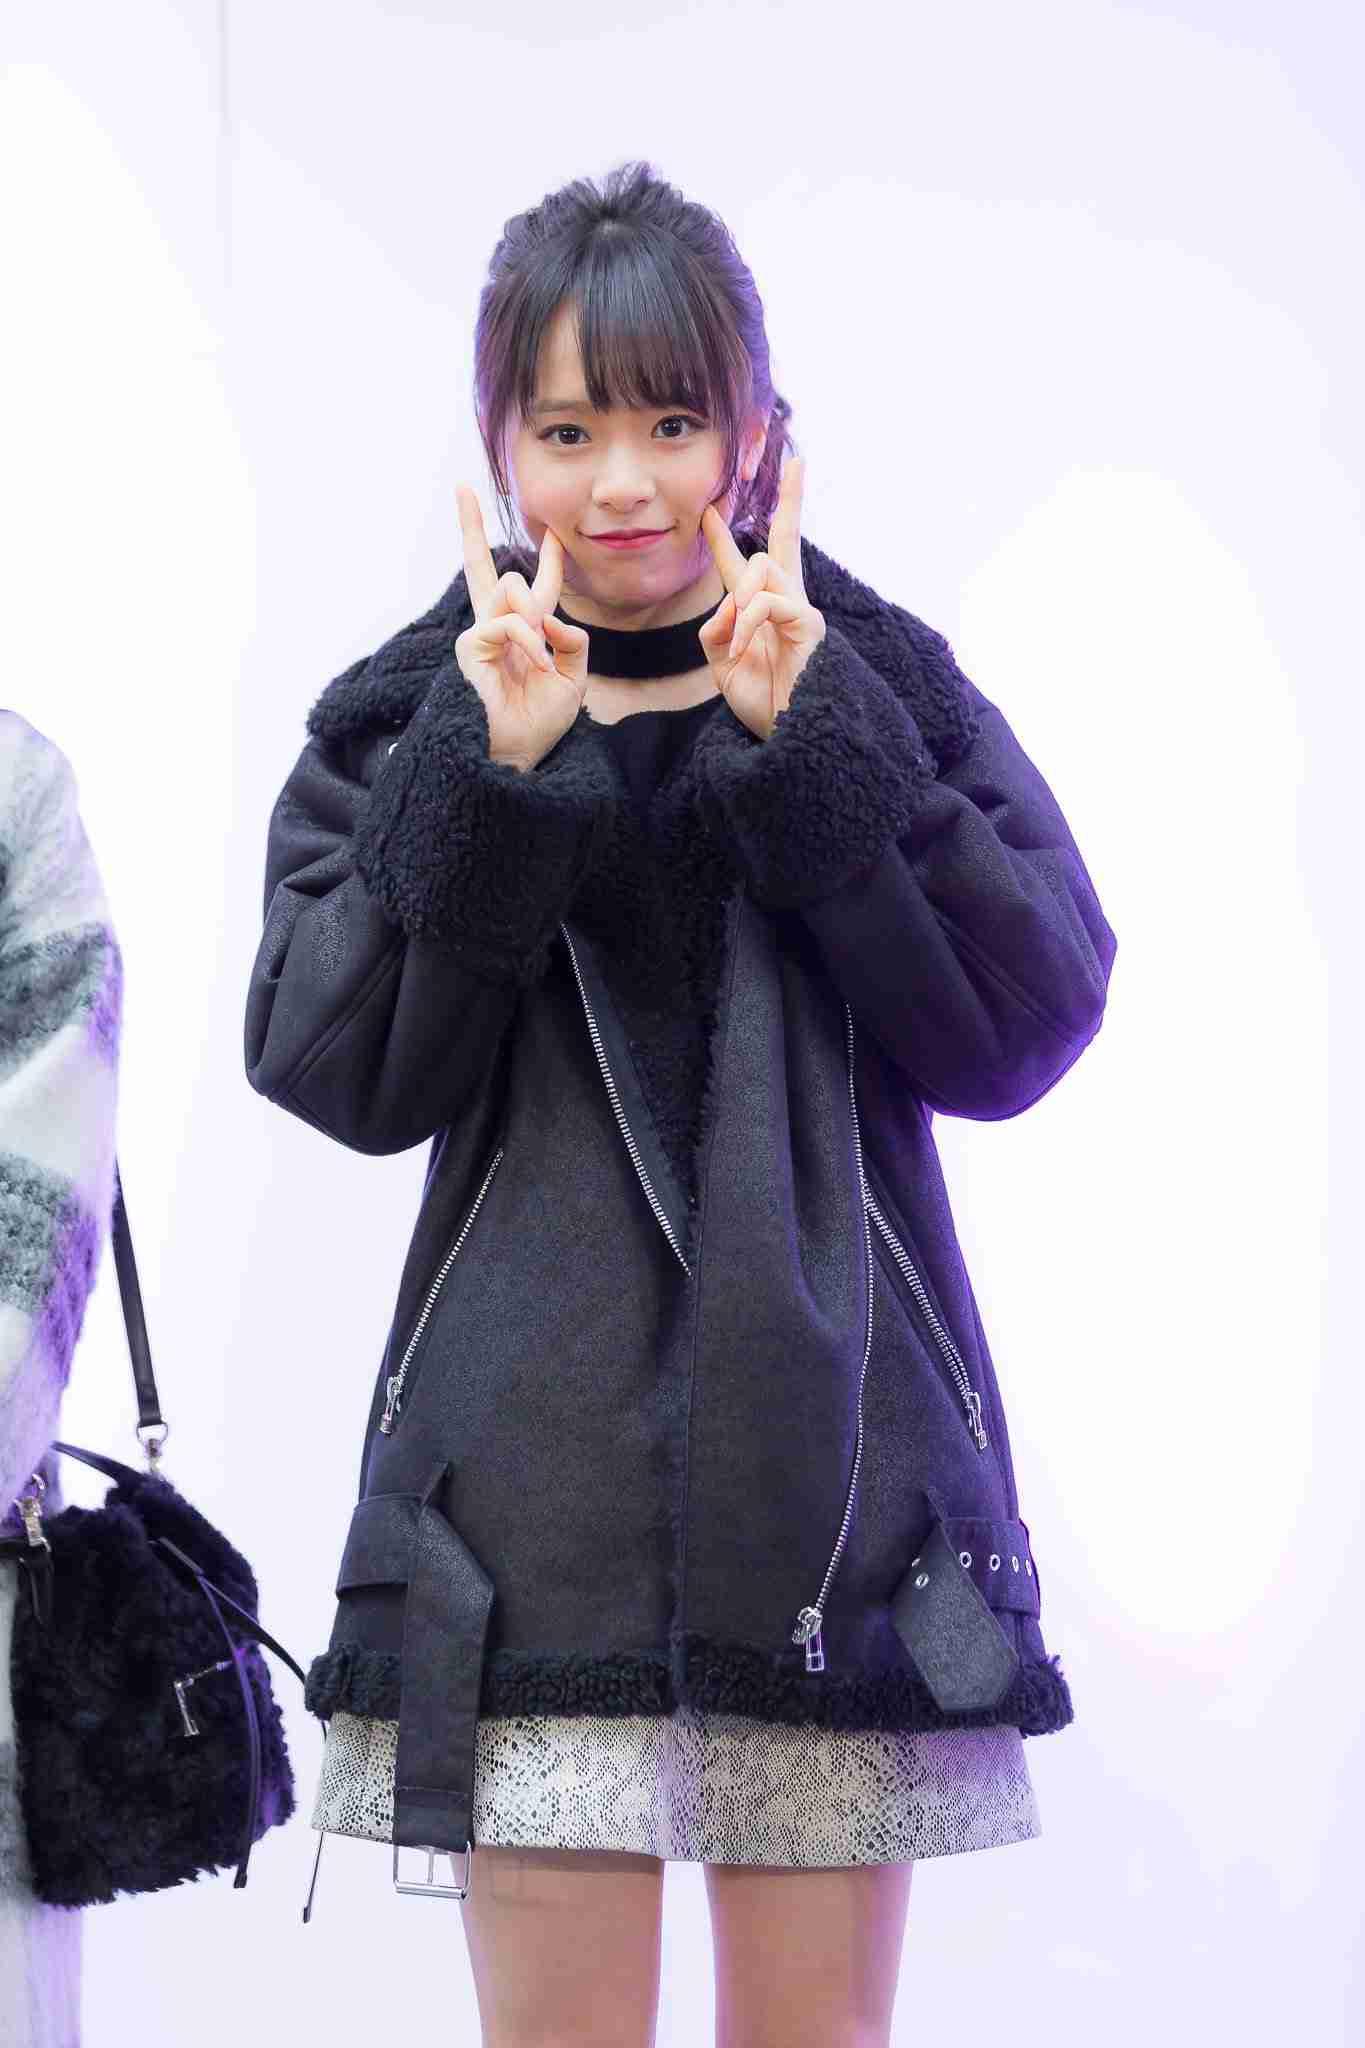 NHKクロ現の若者の恋愛離れ特集! 原因のひとつにAKB48握手会→「名指し批判」で騒動に!?